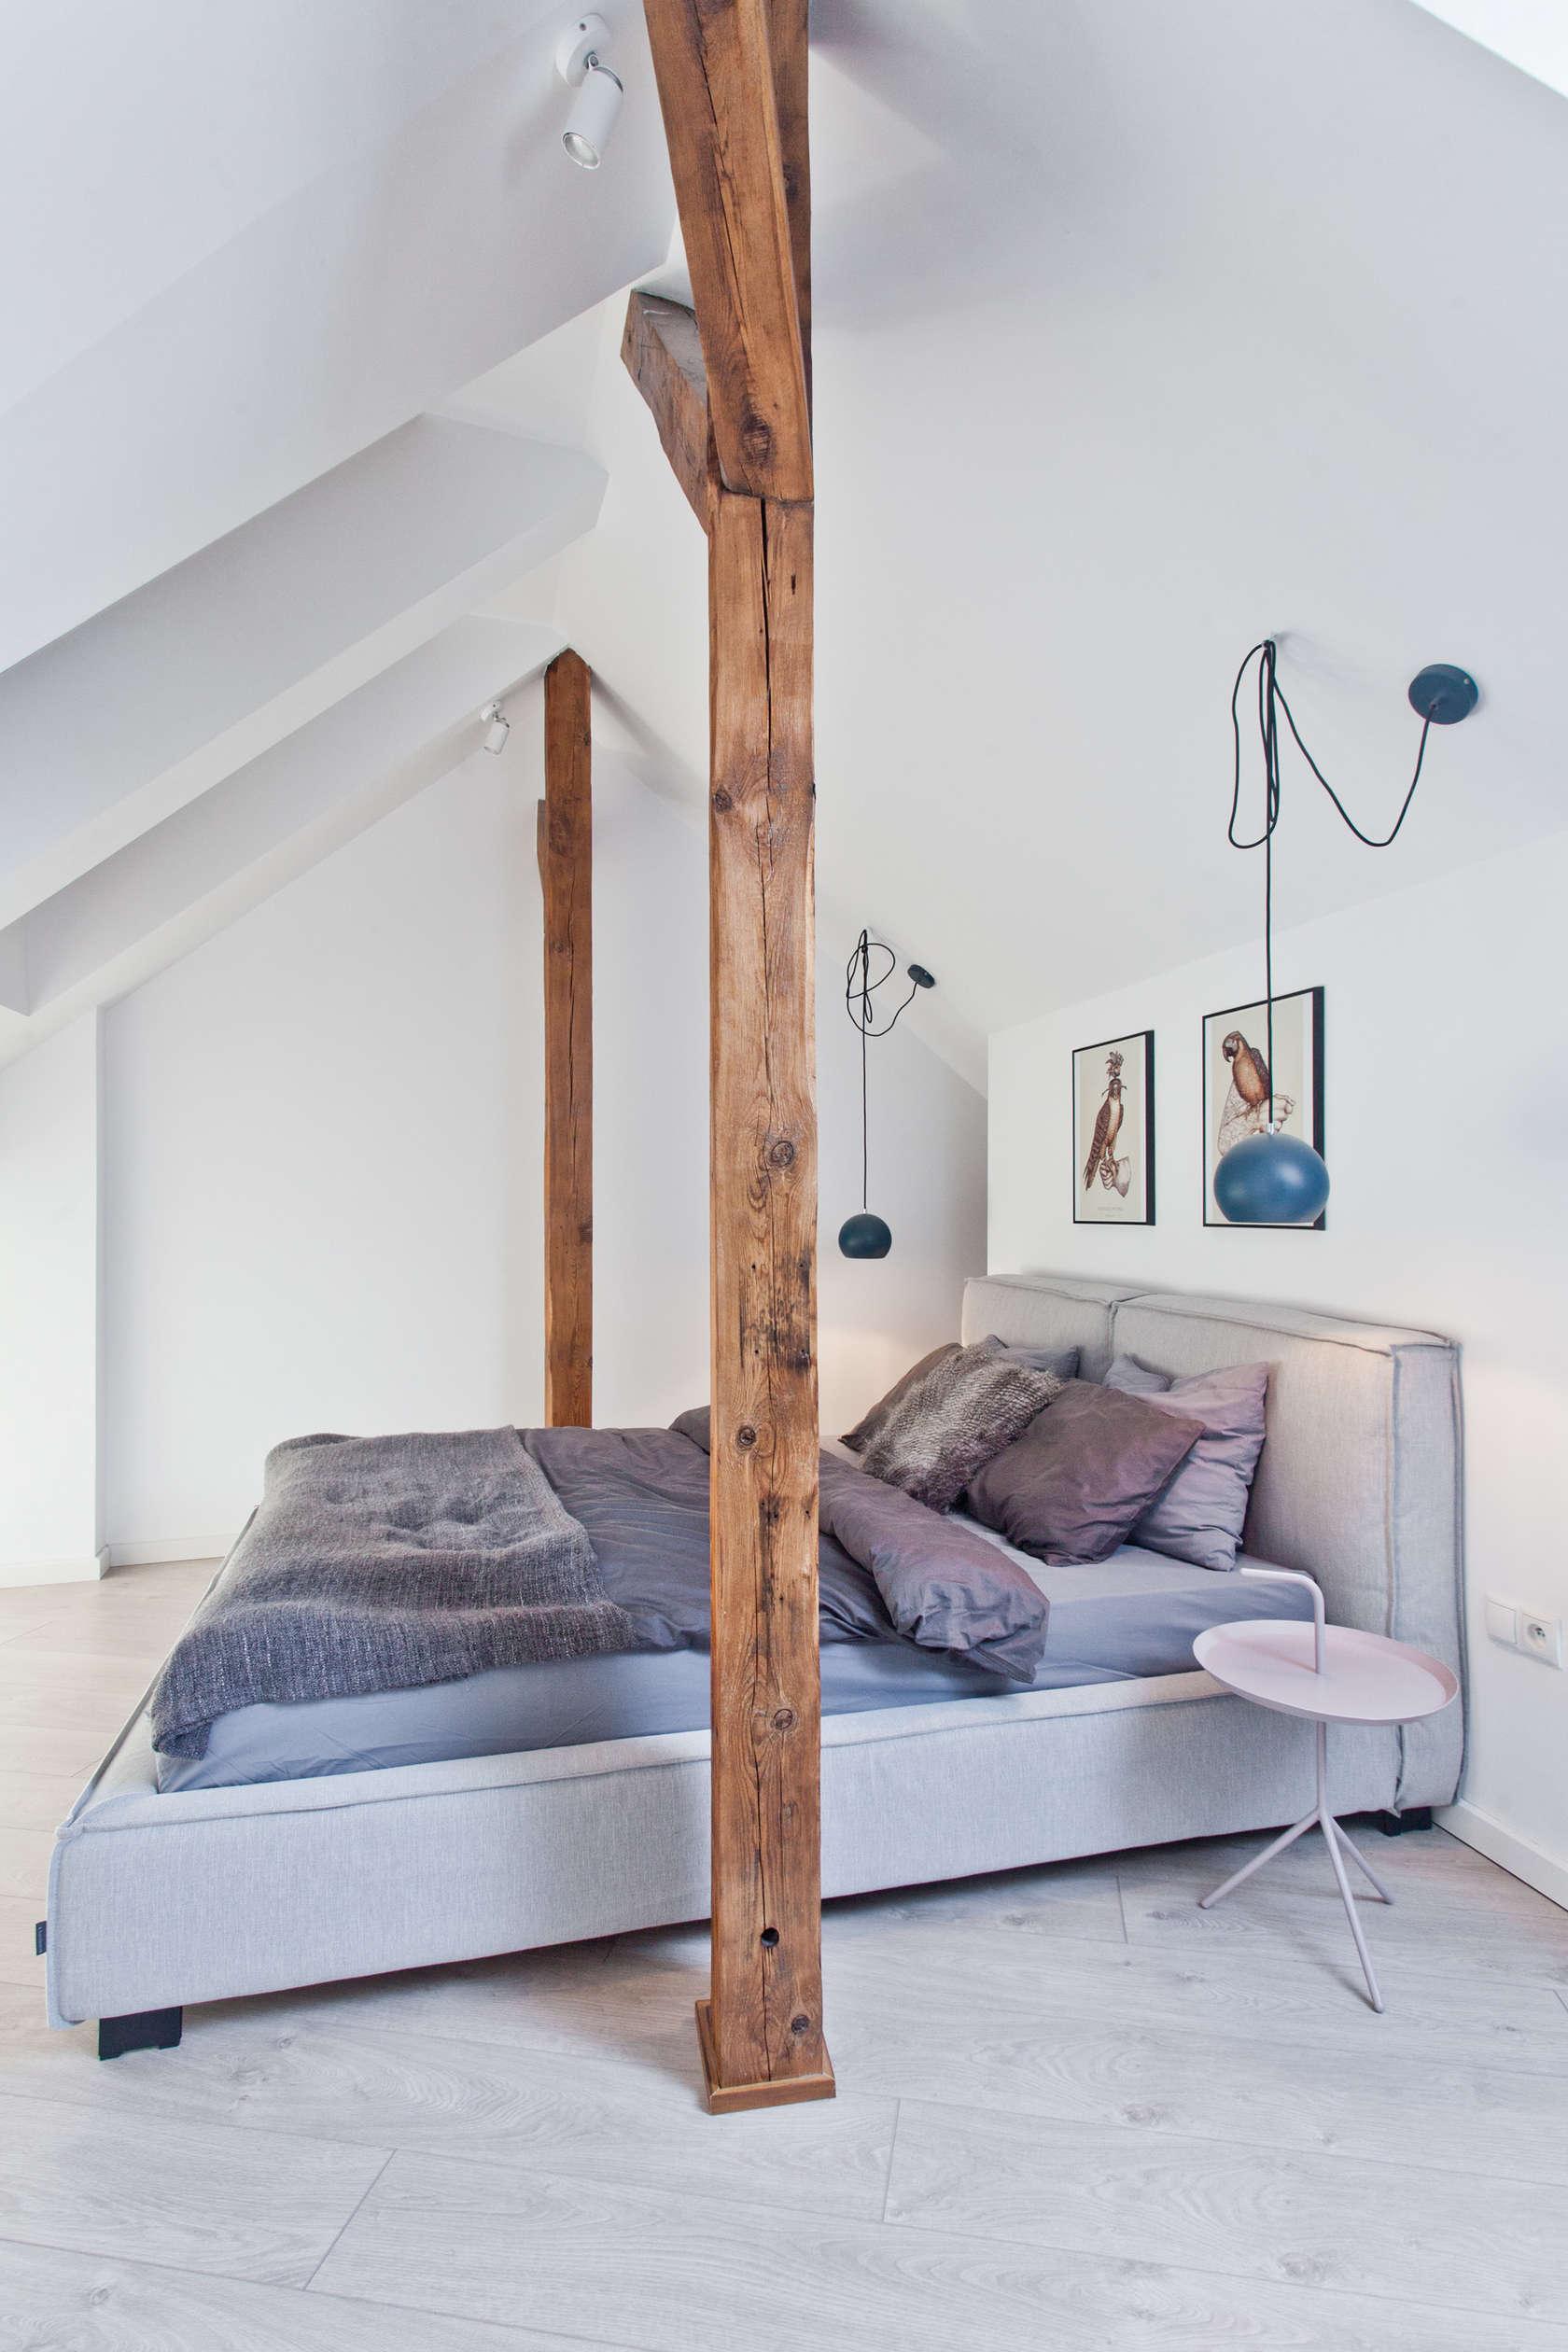 Luxurious bedroom using white theme